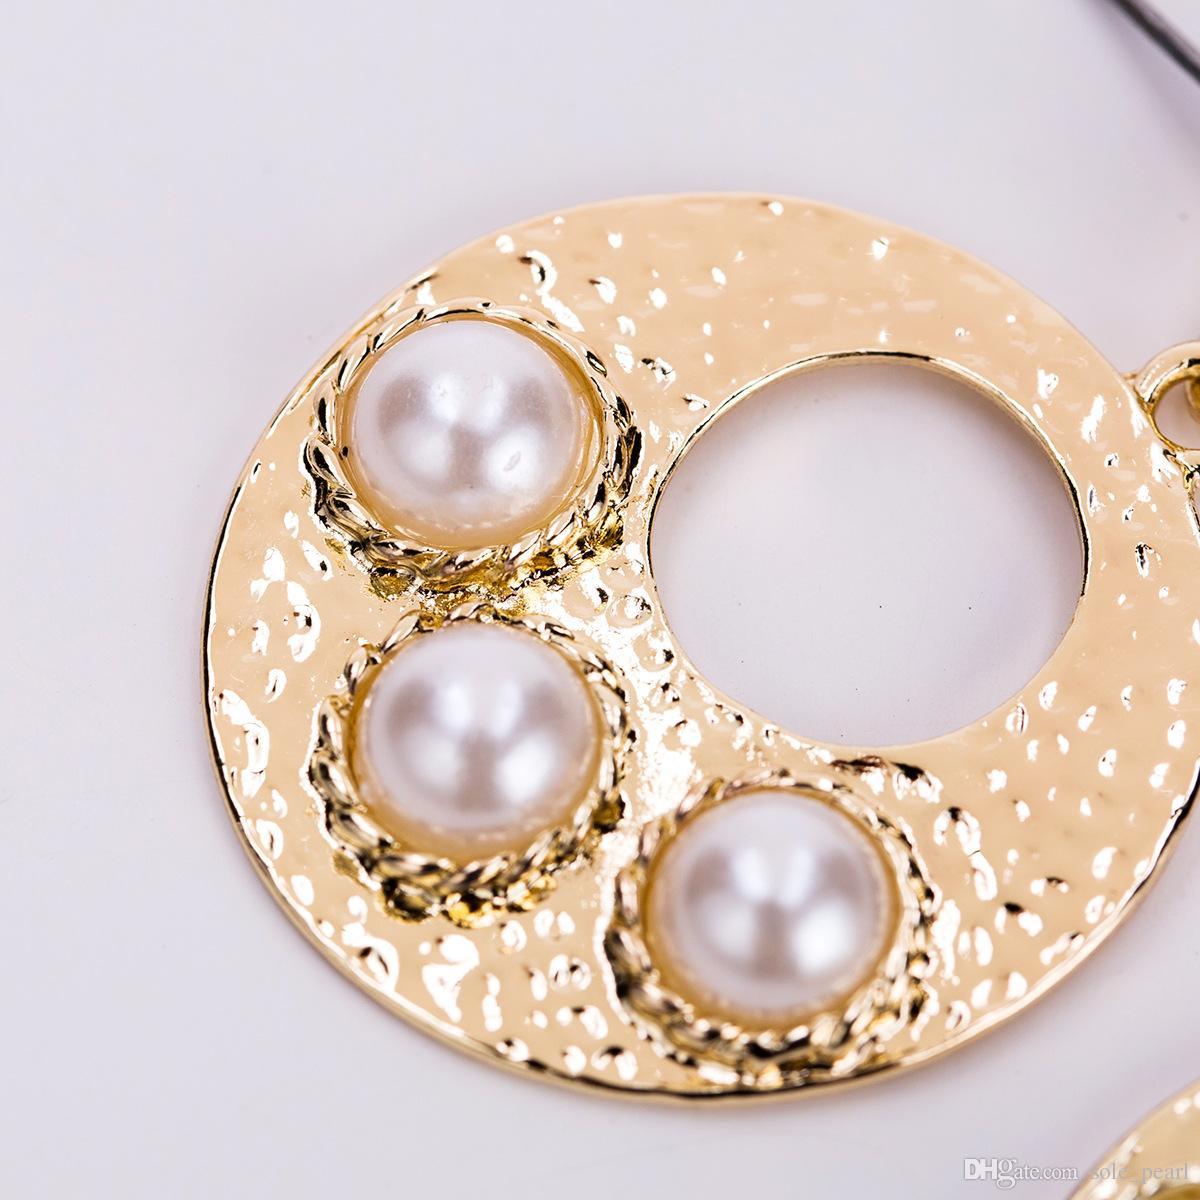 earings Vintage contract luxury Multilayer Geometric Imitation pearls alloy Drop Earrings gold color for Women Jewelry dangle Earrings 2018